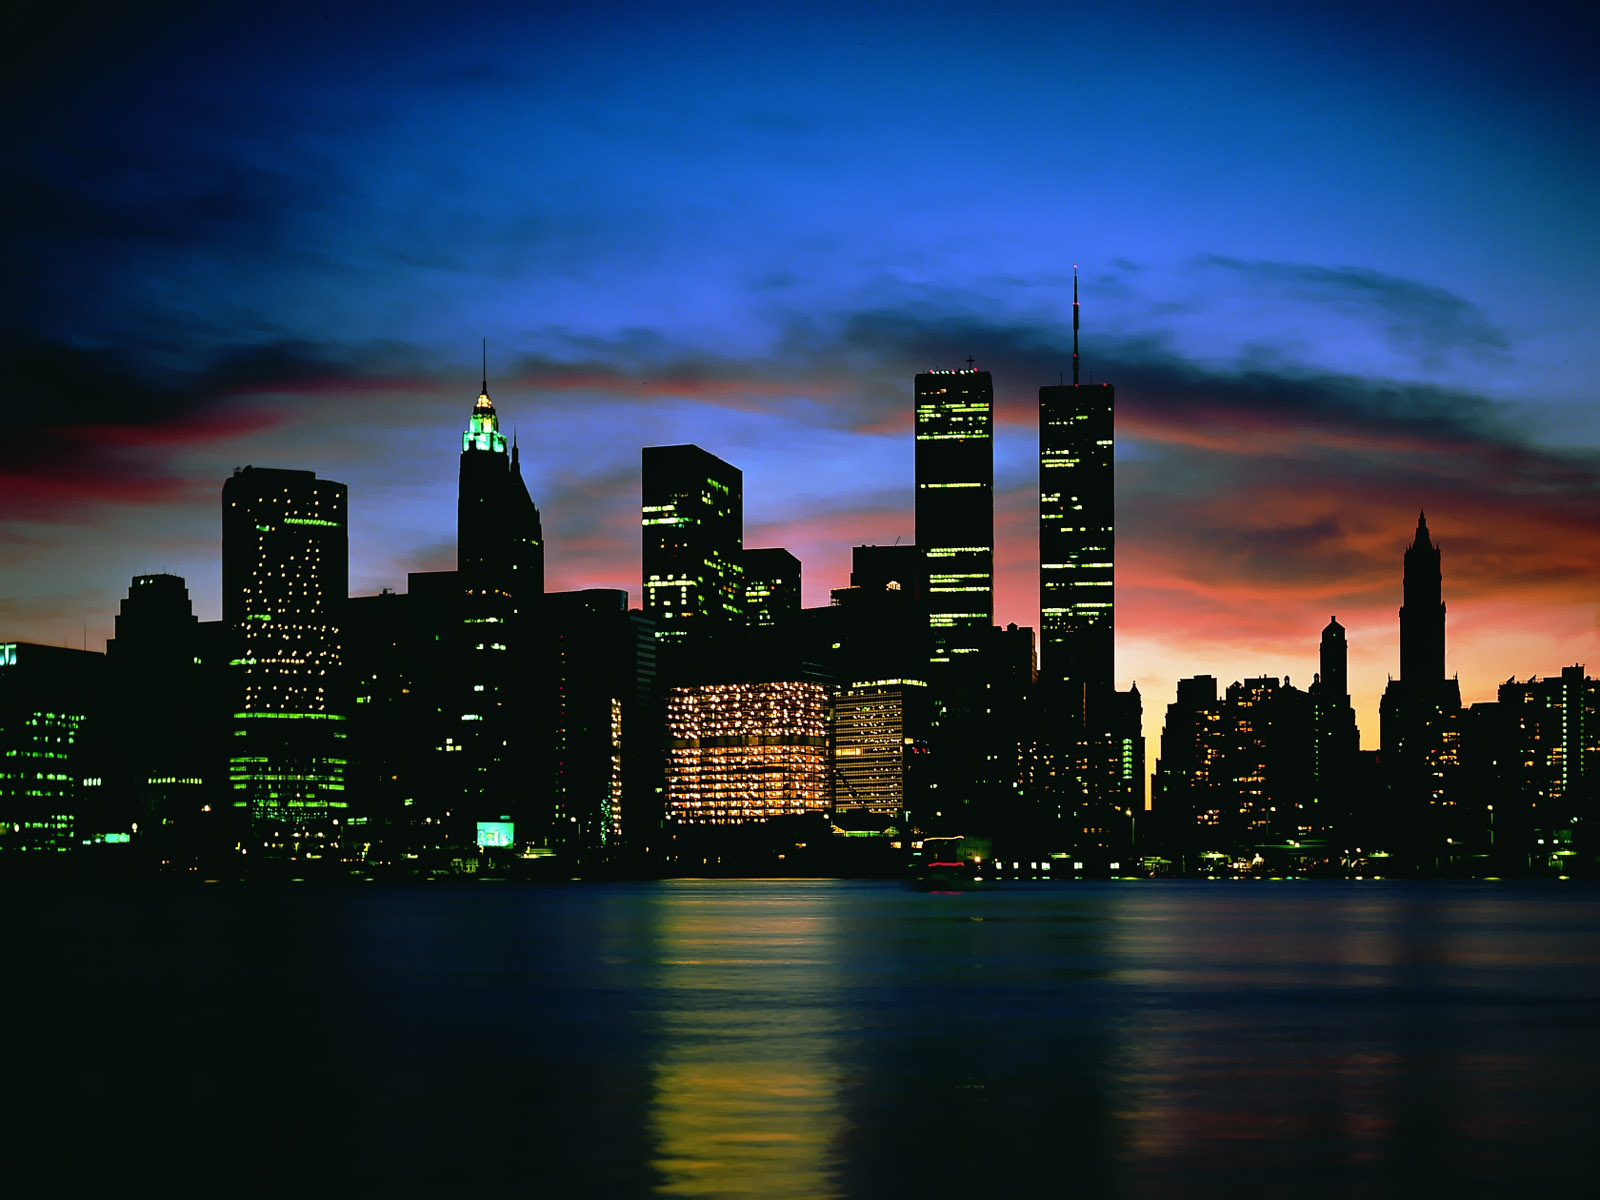 http://1.bp.blogspot.com/_dzEpMszKD6Y/TSIP-Byo_xI/AAAAAAAABOQ/e3jJbHh0S-c/s1600/City+Night+Scenes+Wallpapers+13.jpg